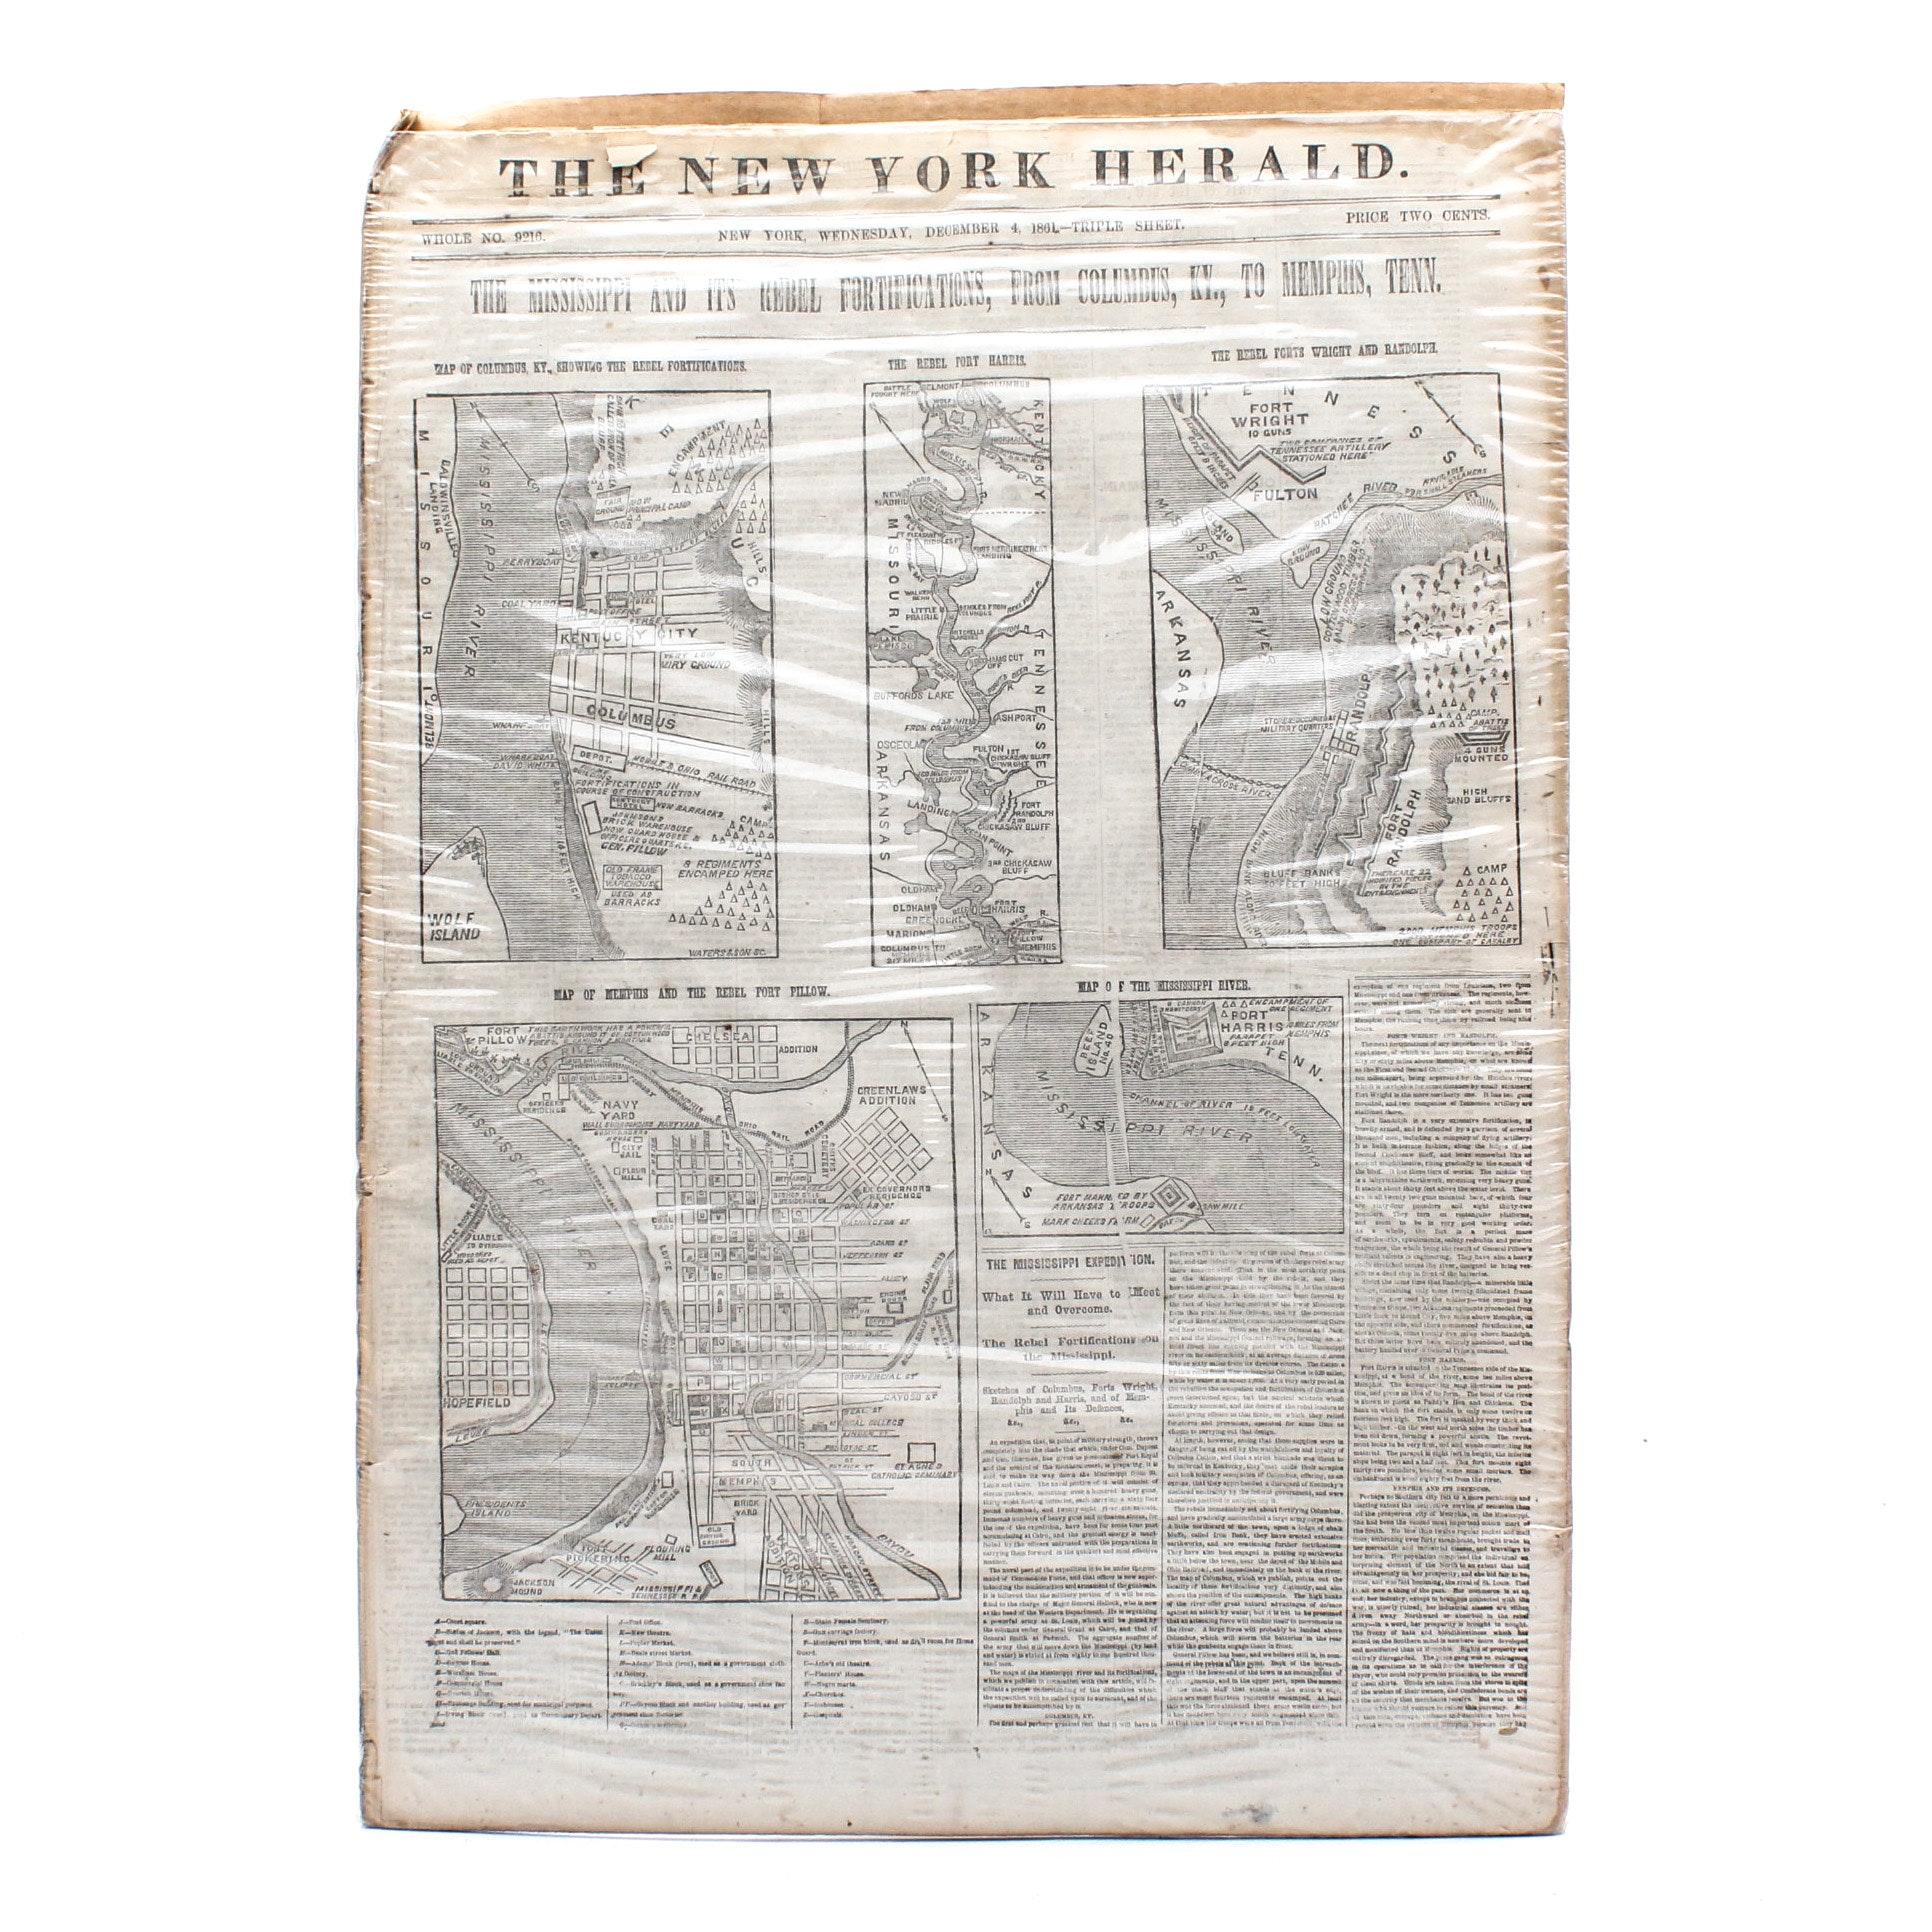 1861 New York Herald with Civil War Maps